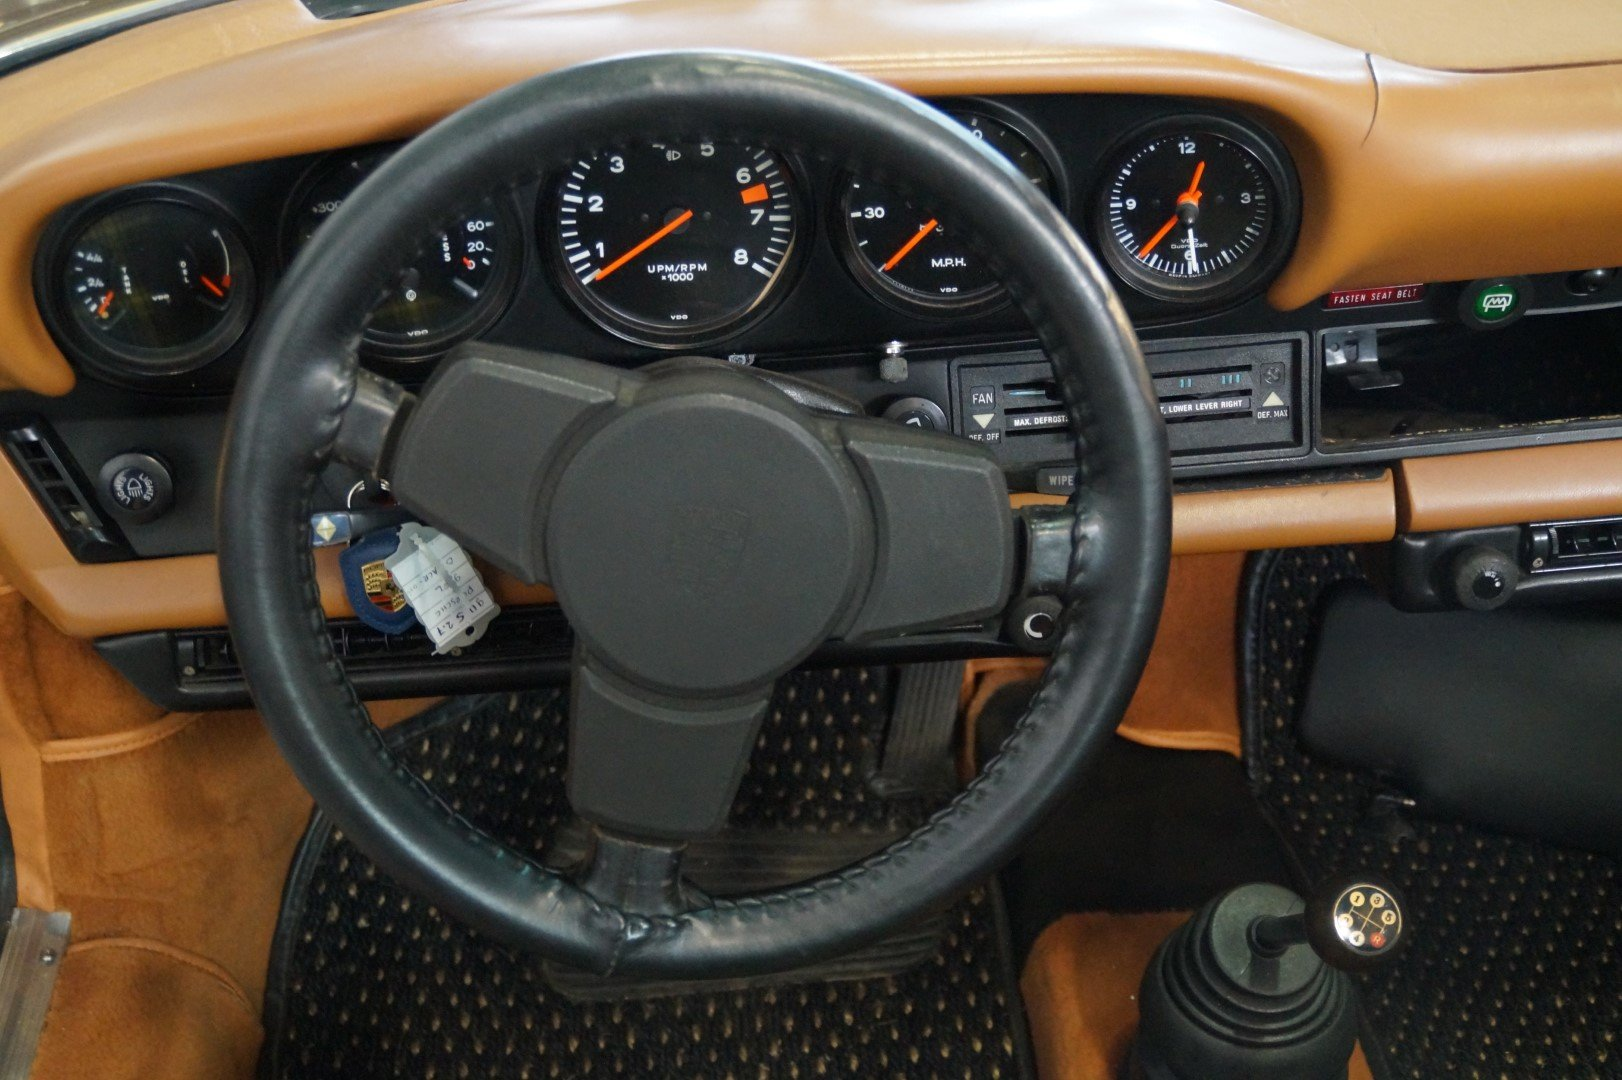 PORSCHE 911 911S 2.7 Targa Rare Colour Combination (1974) For Sale (picture 4 of 6)